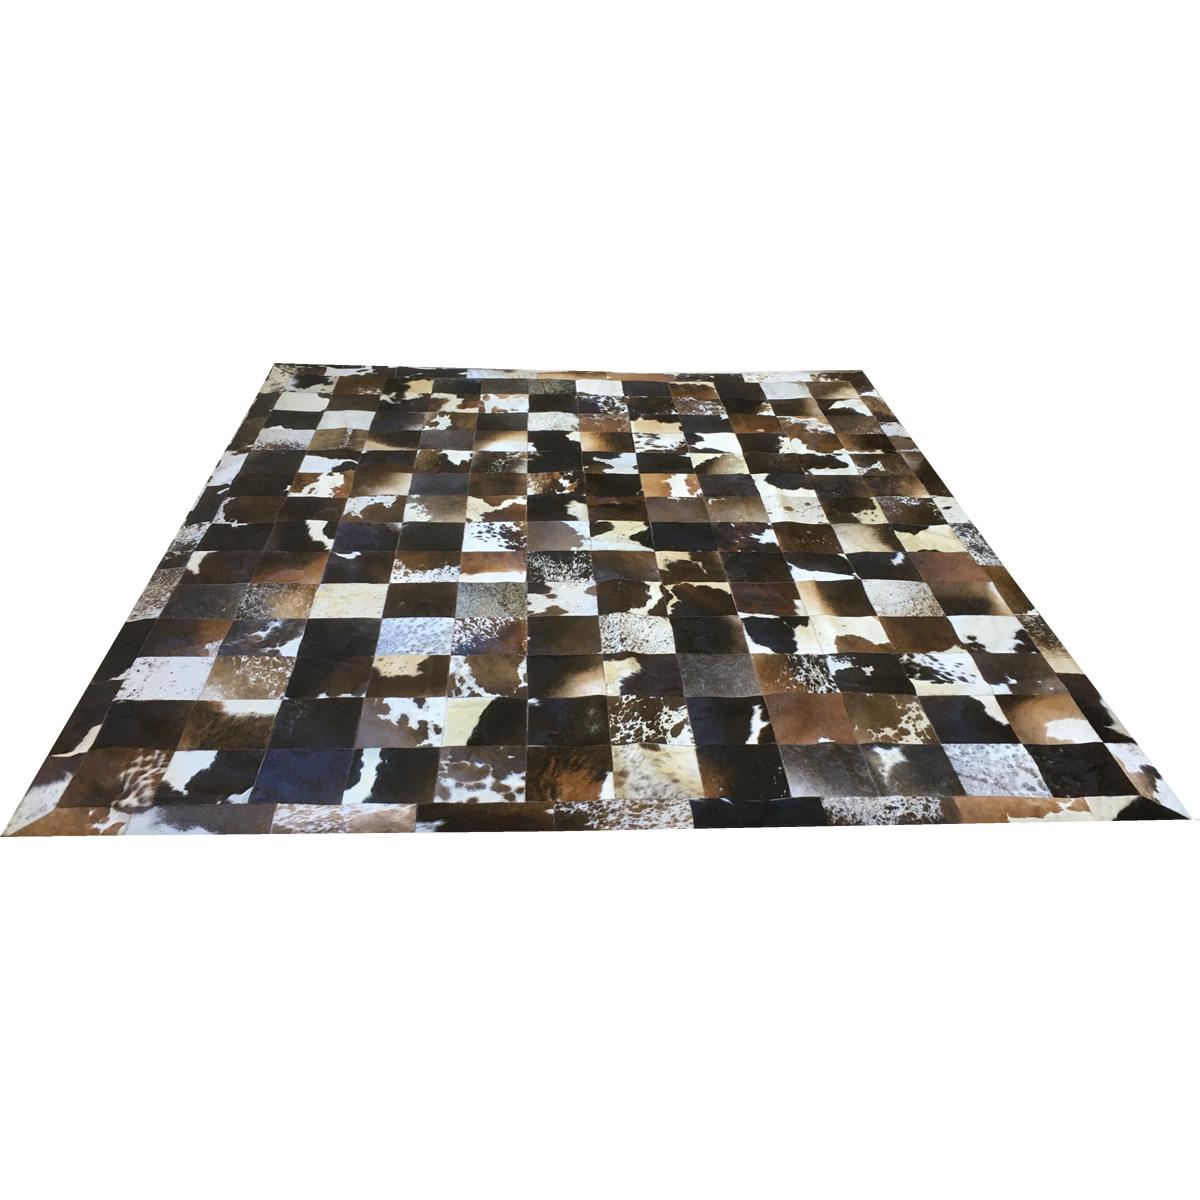 Tapete de couro marrom malhado escuro 2,60x3,00 c/b pç 20x20